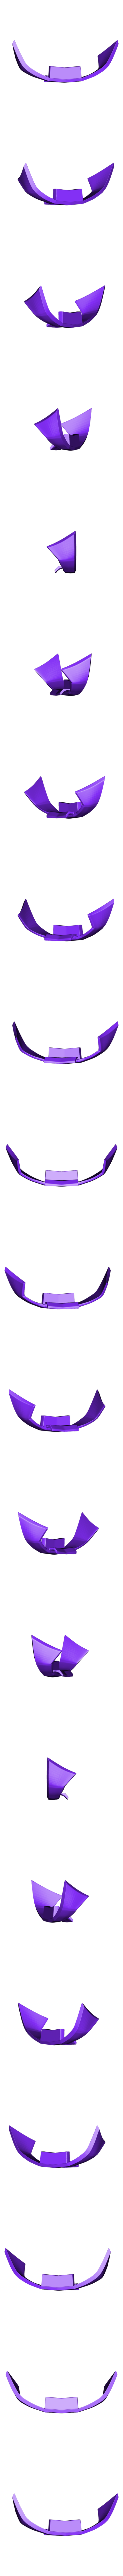 Lucio_body_btm.stl Download free STL file Overwatch Lucio Blaster • 3D printer object, Adafruit